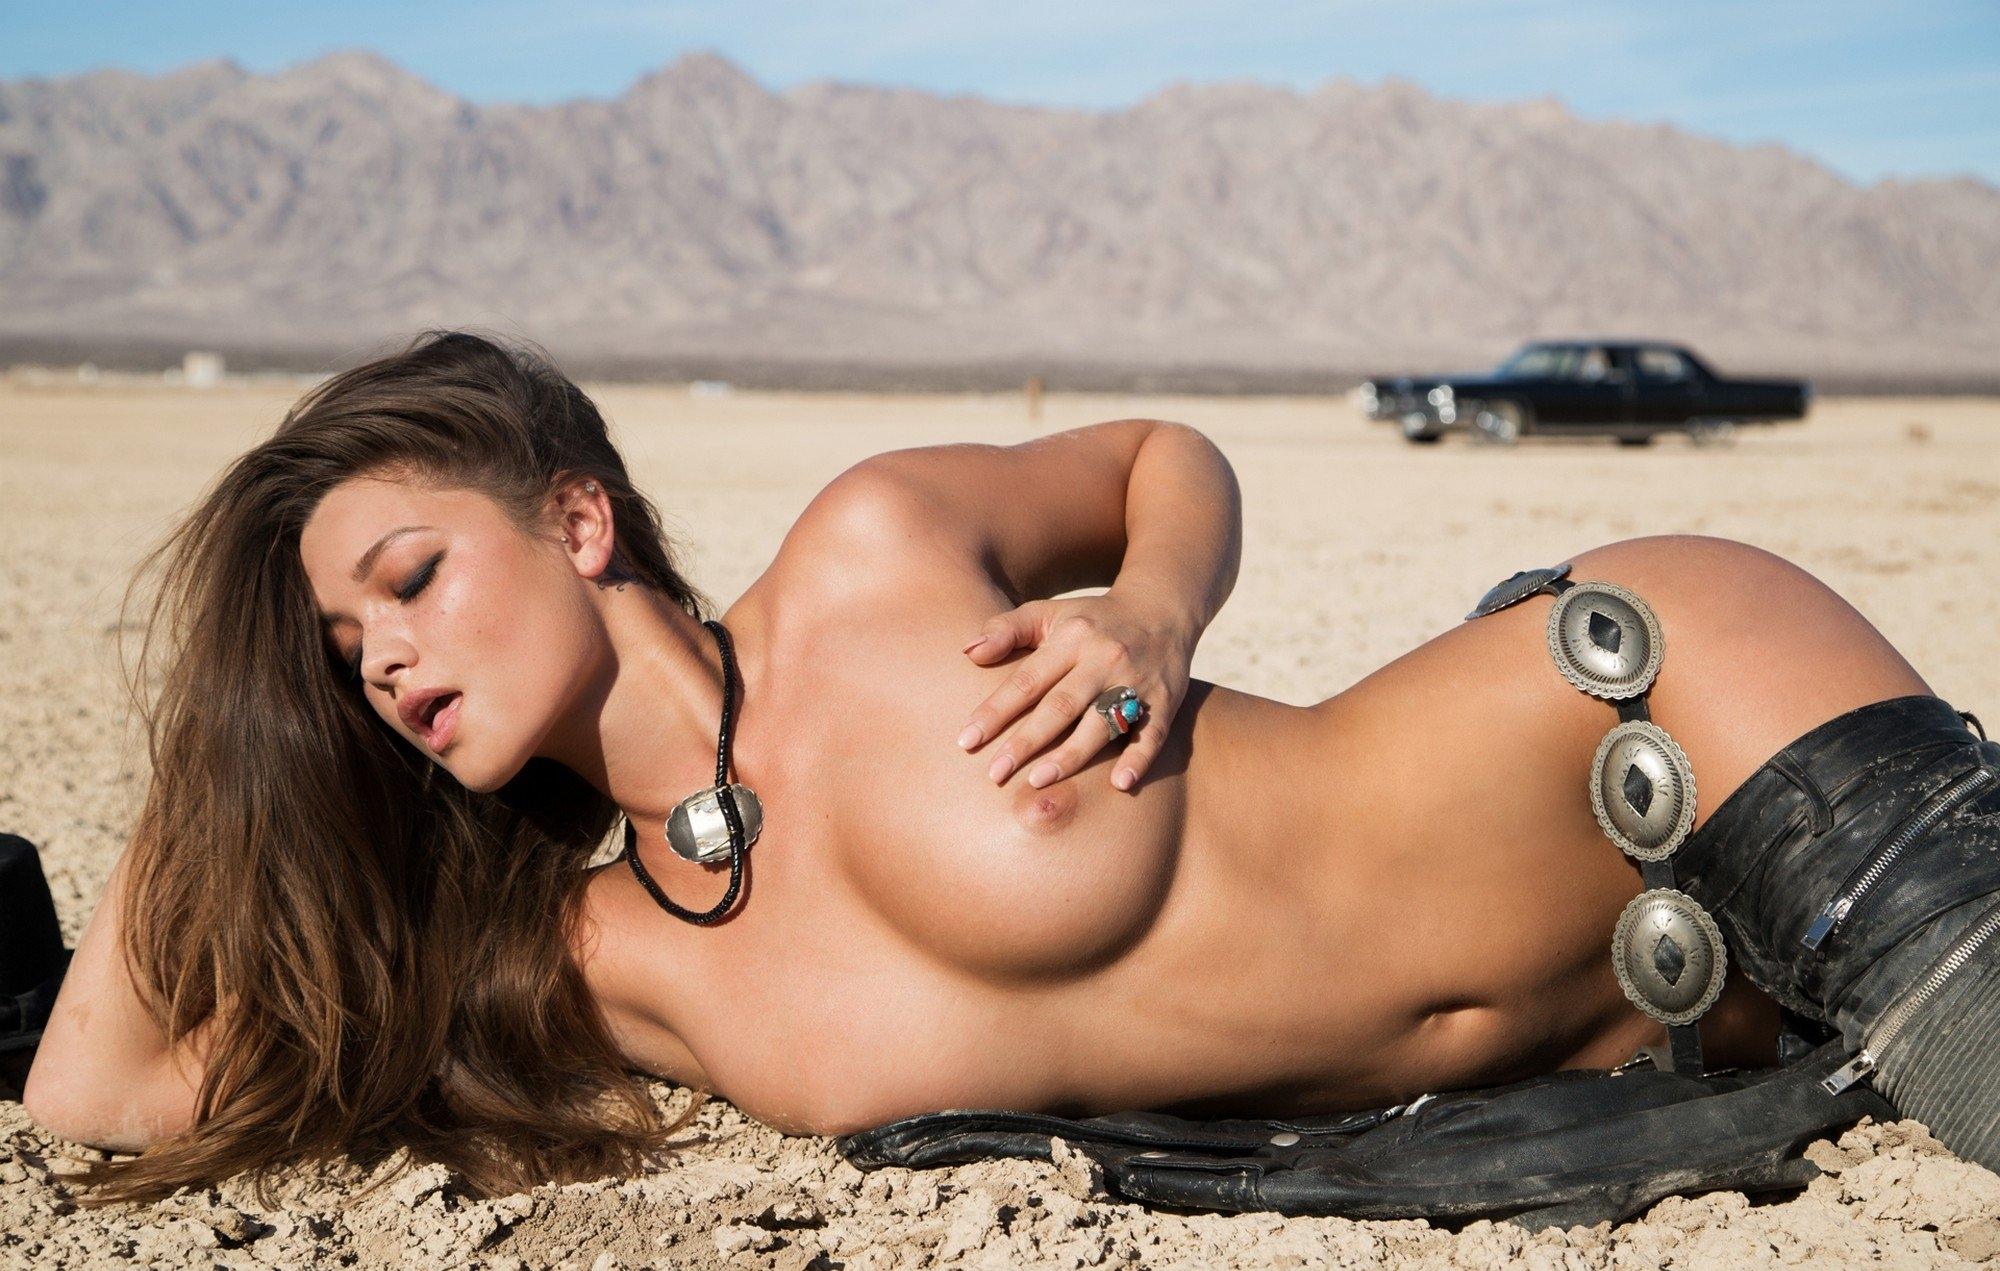 American nude hot girls #4